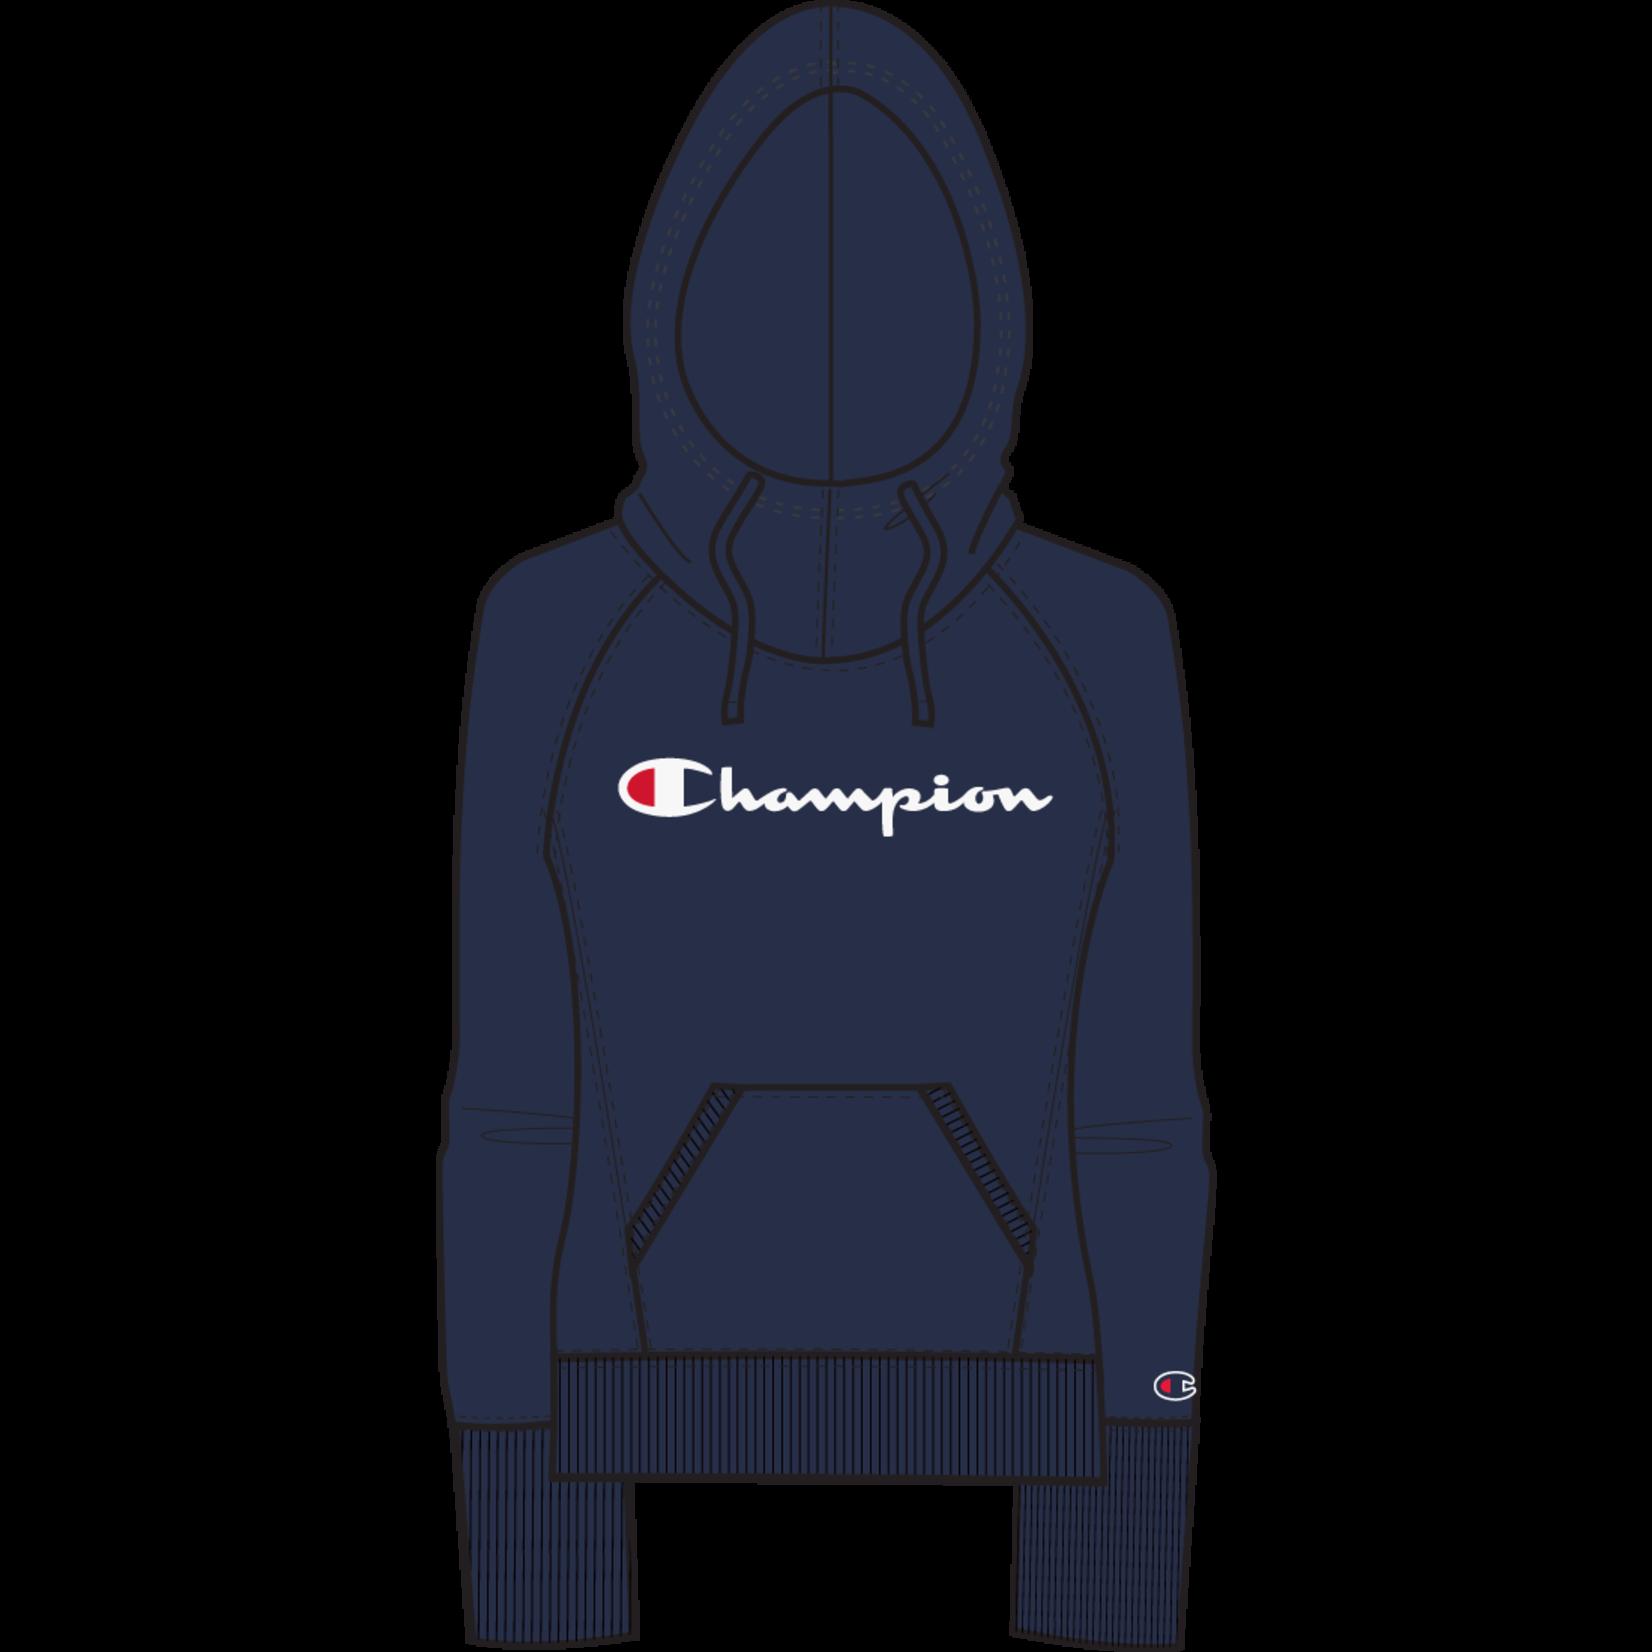 Champion Champion Hoodie, Powerblend, Ladies